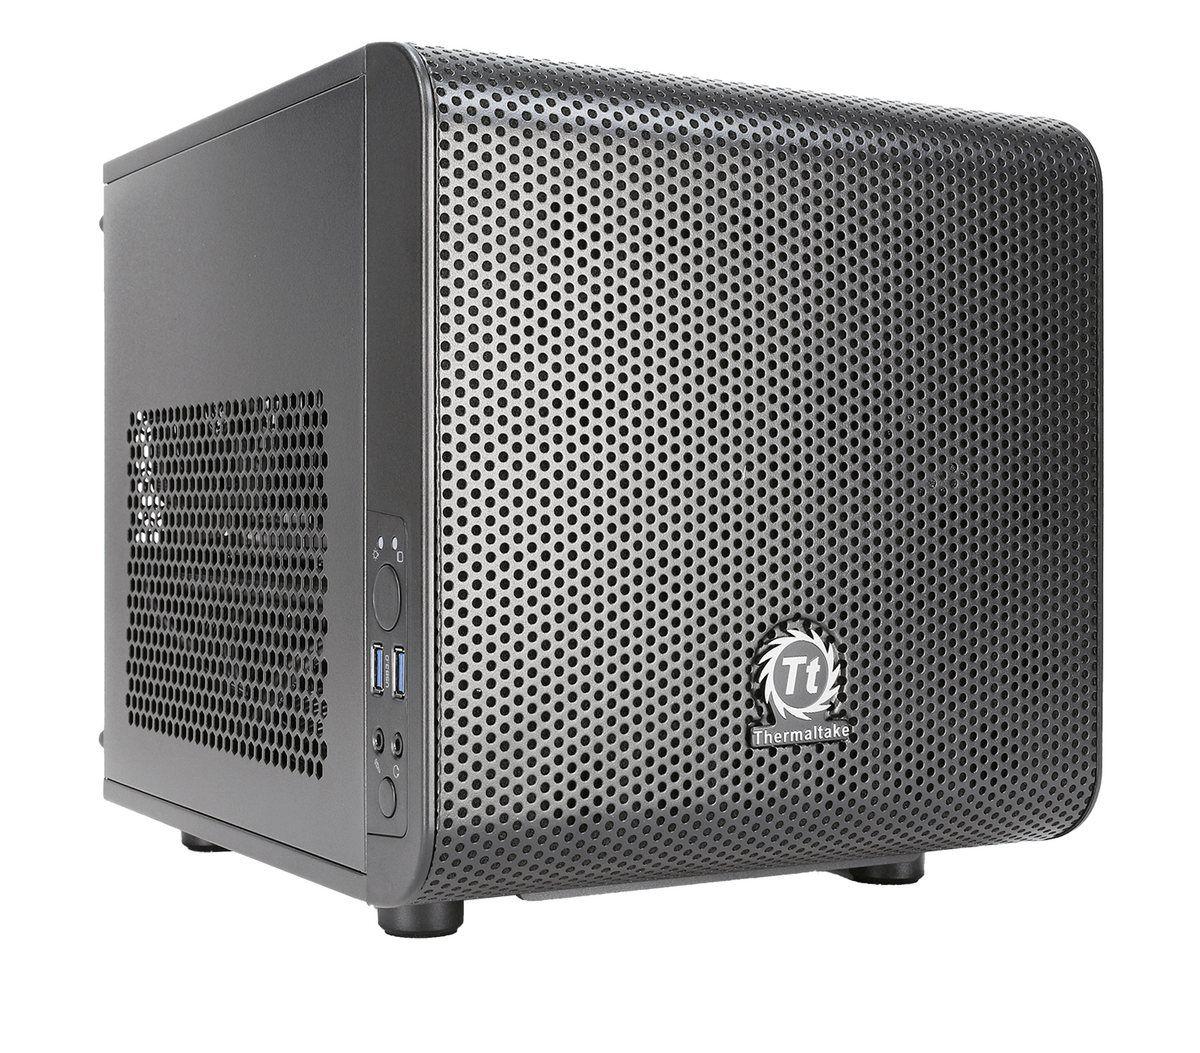 Advanced Gaming I54-156 Gaming-PC (Intel Core i5, GTX 1650, 16 GB RAM, 500 GB SSD, Luftkühlung)